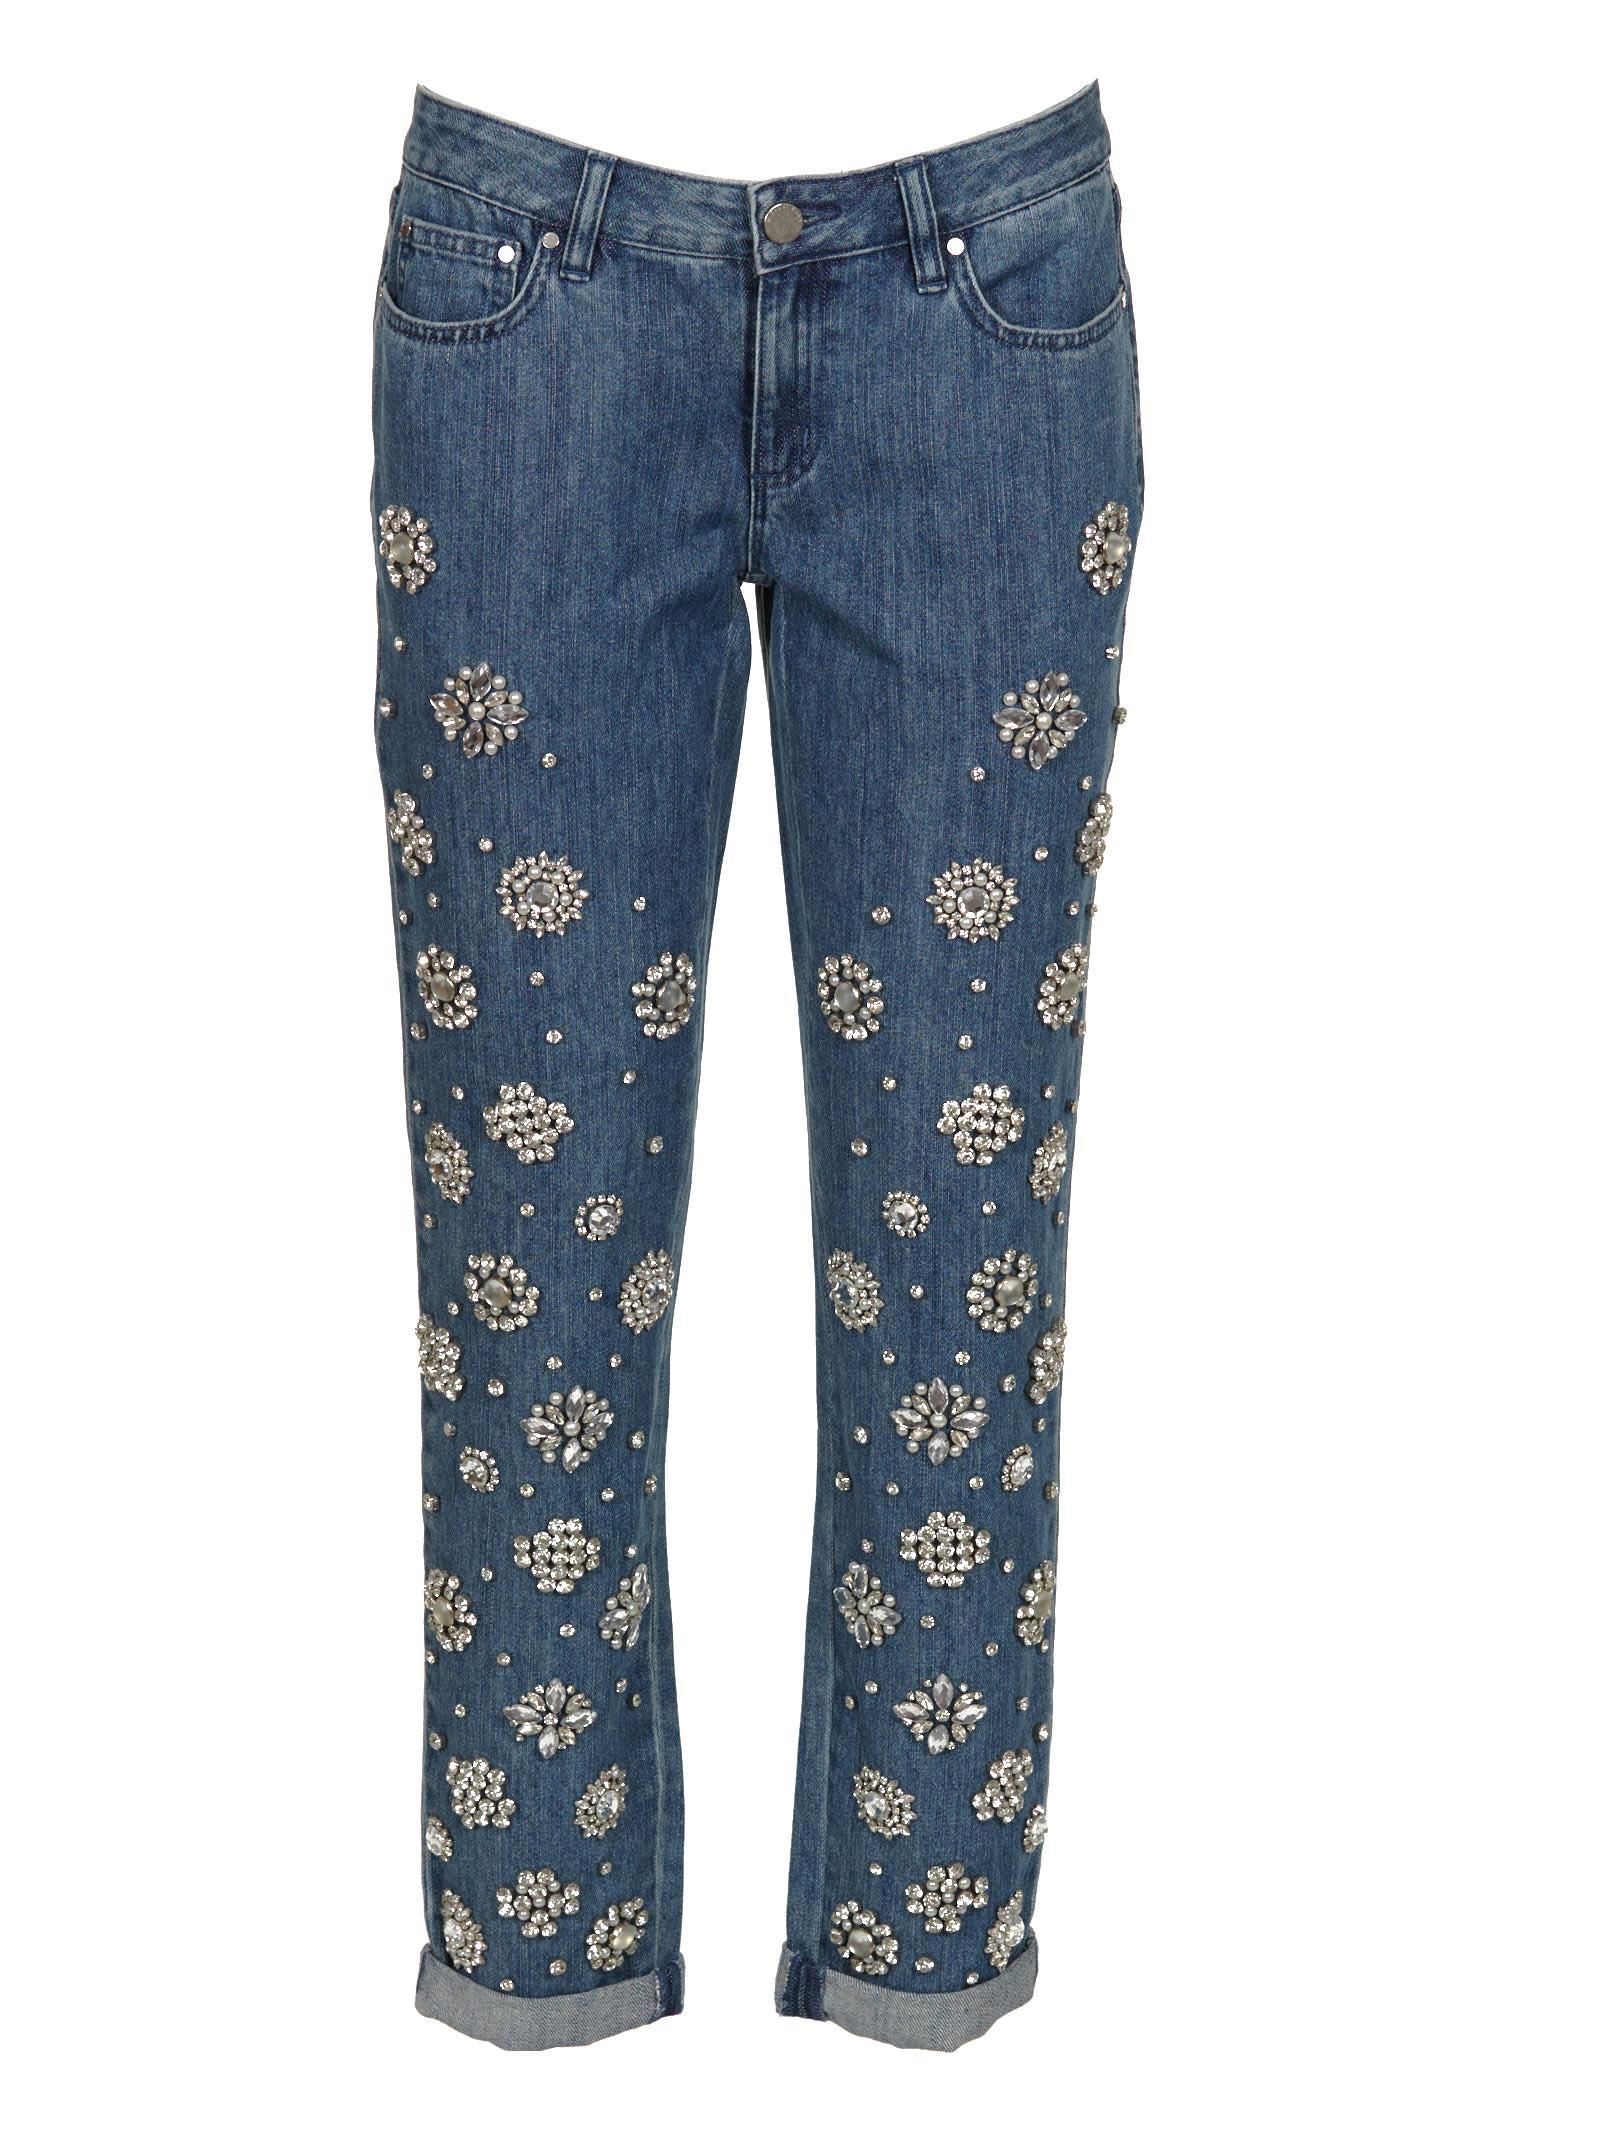 Michael Kors Bejeweled Jeans